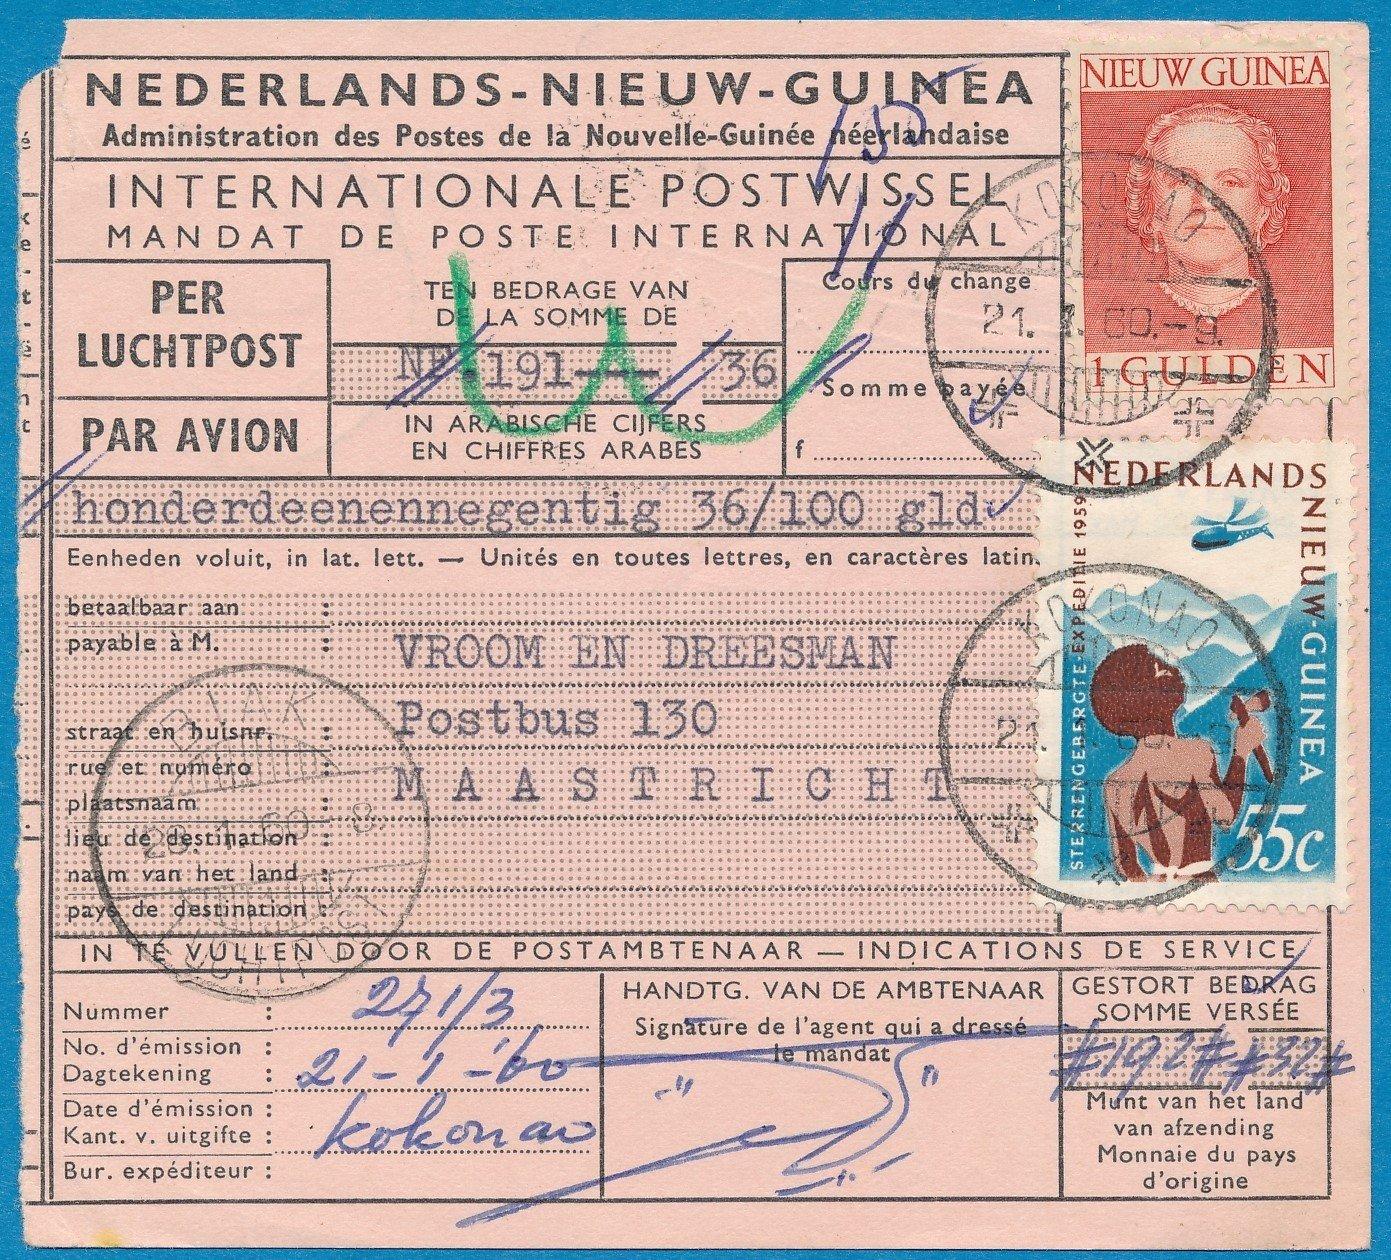 NETHERLANDS NEW GUINEA postal mandate 1960 Kokonao